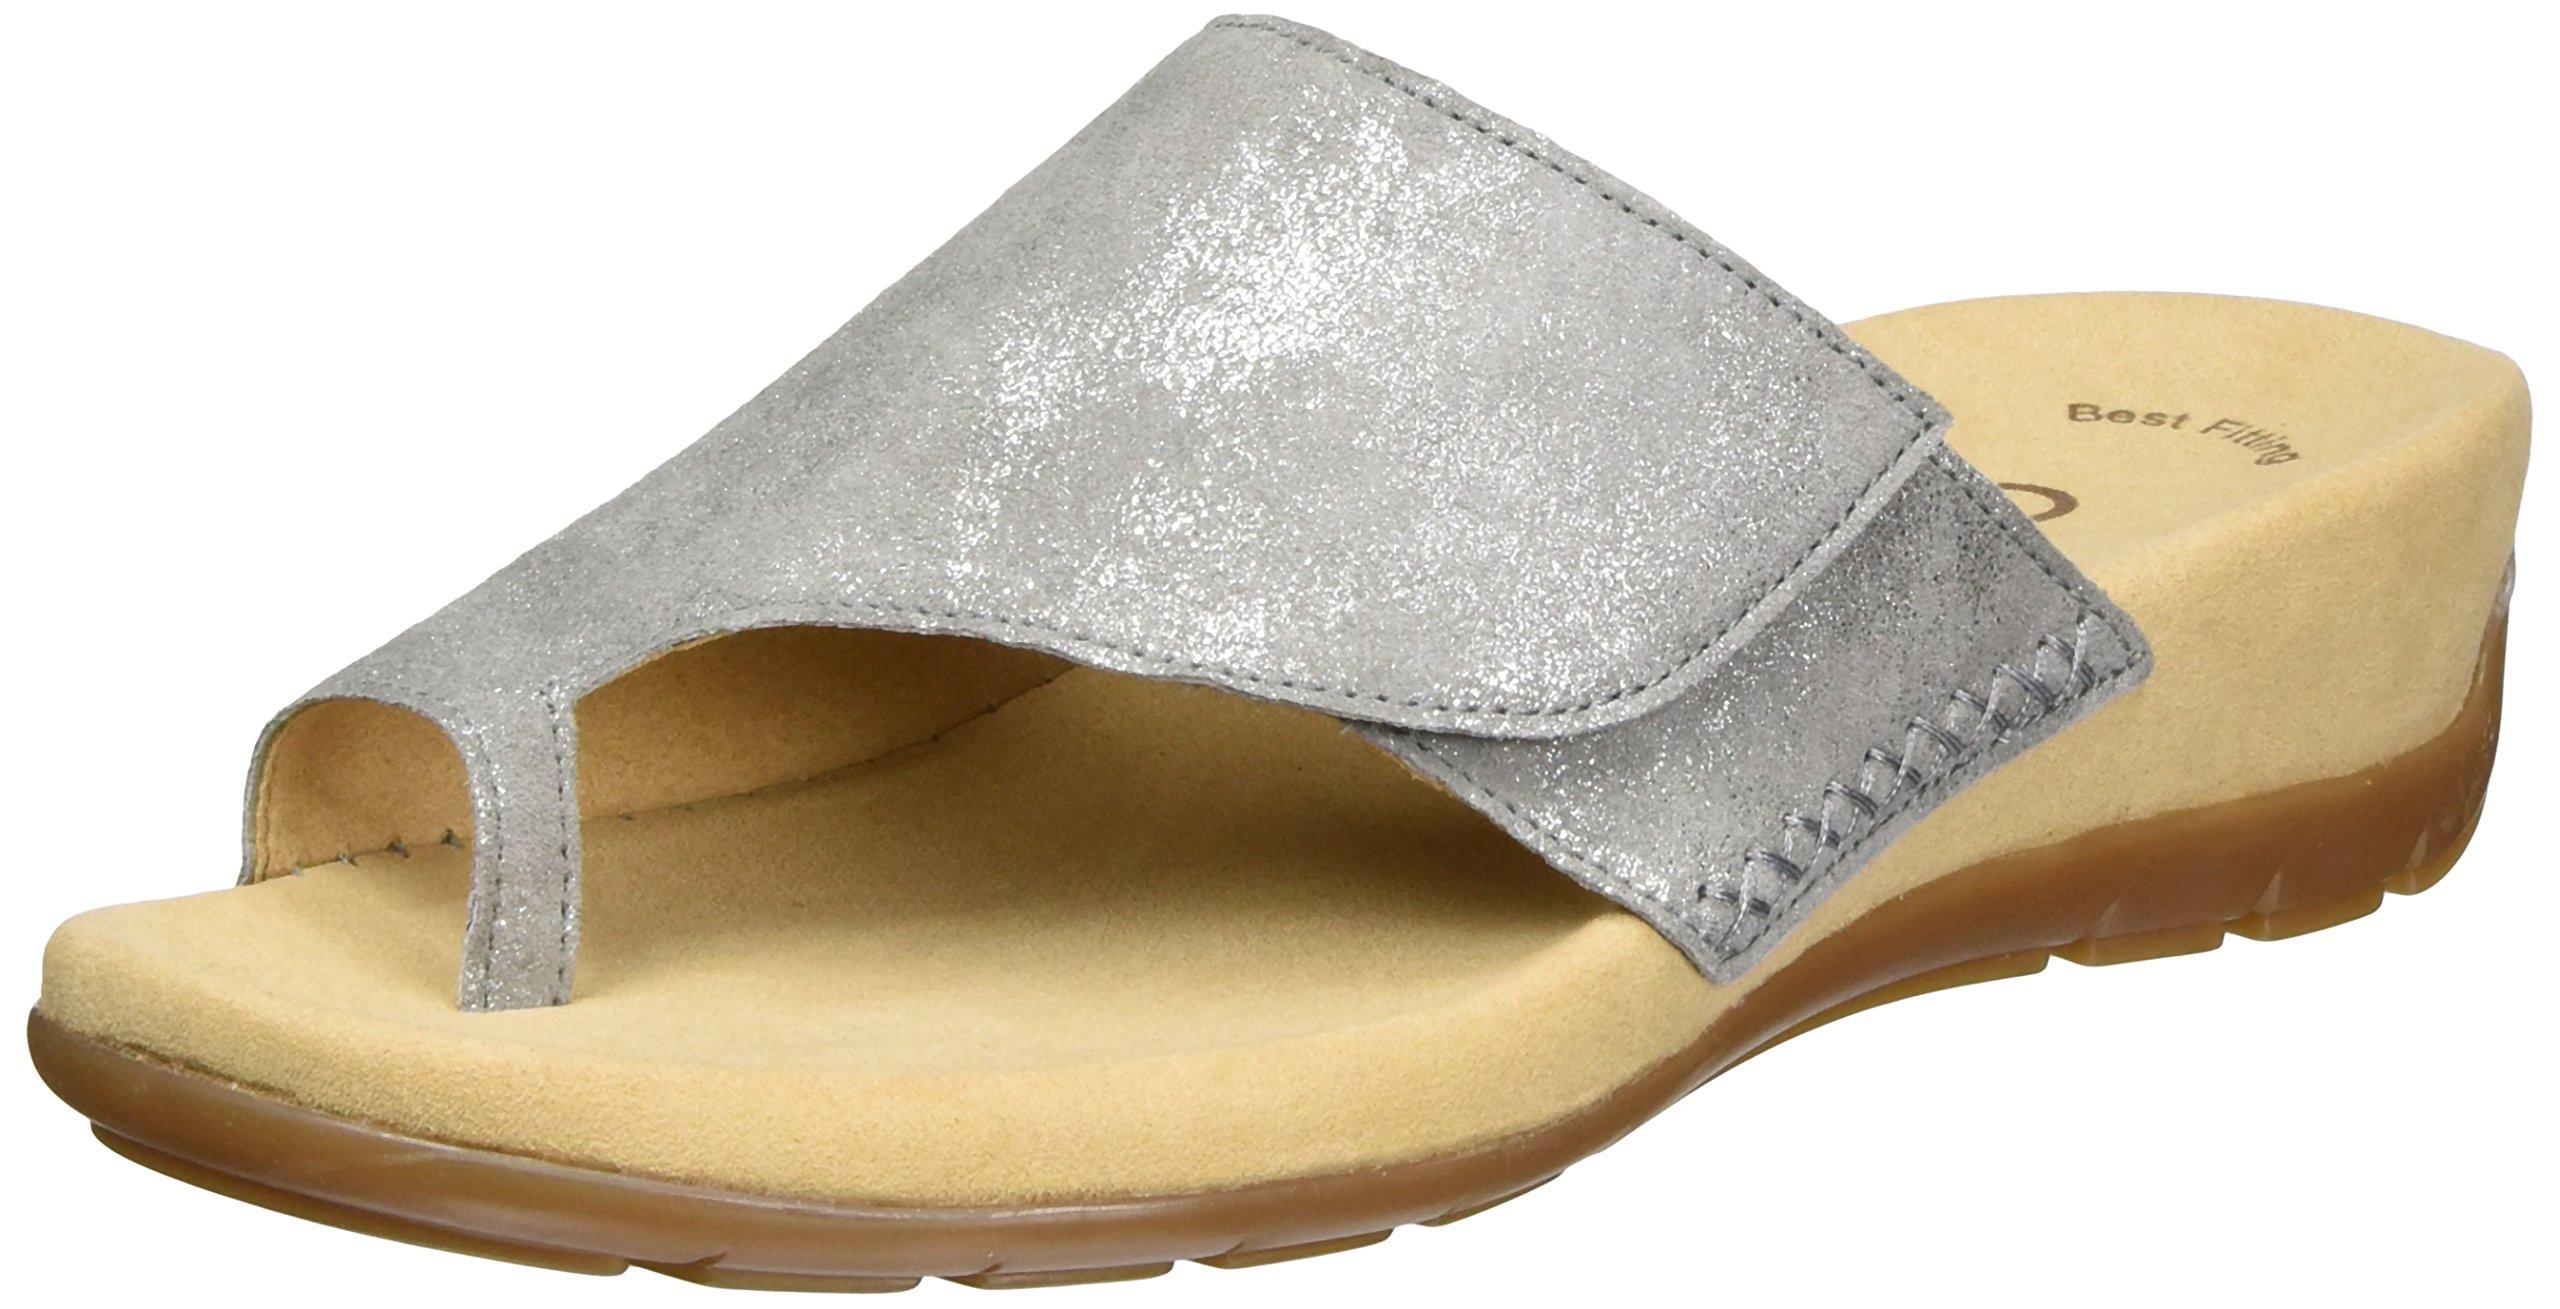 Eu Gabor FemmeGrisgrau Shoes FashionMules 6942 lK1cJF